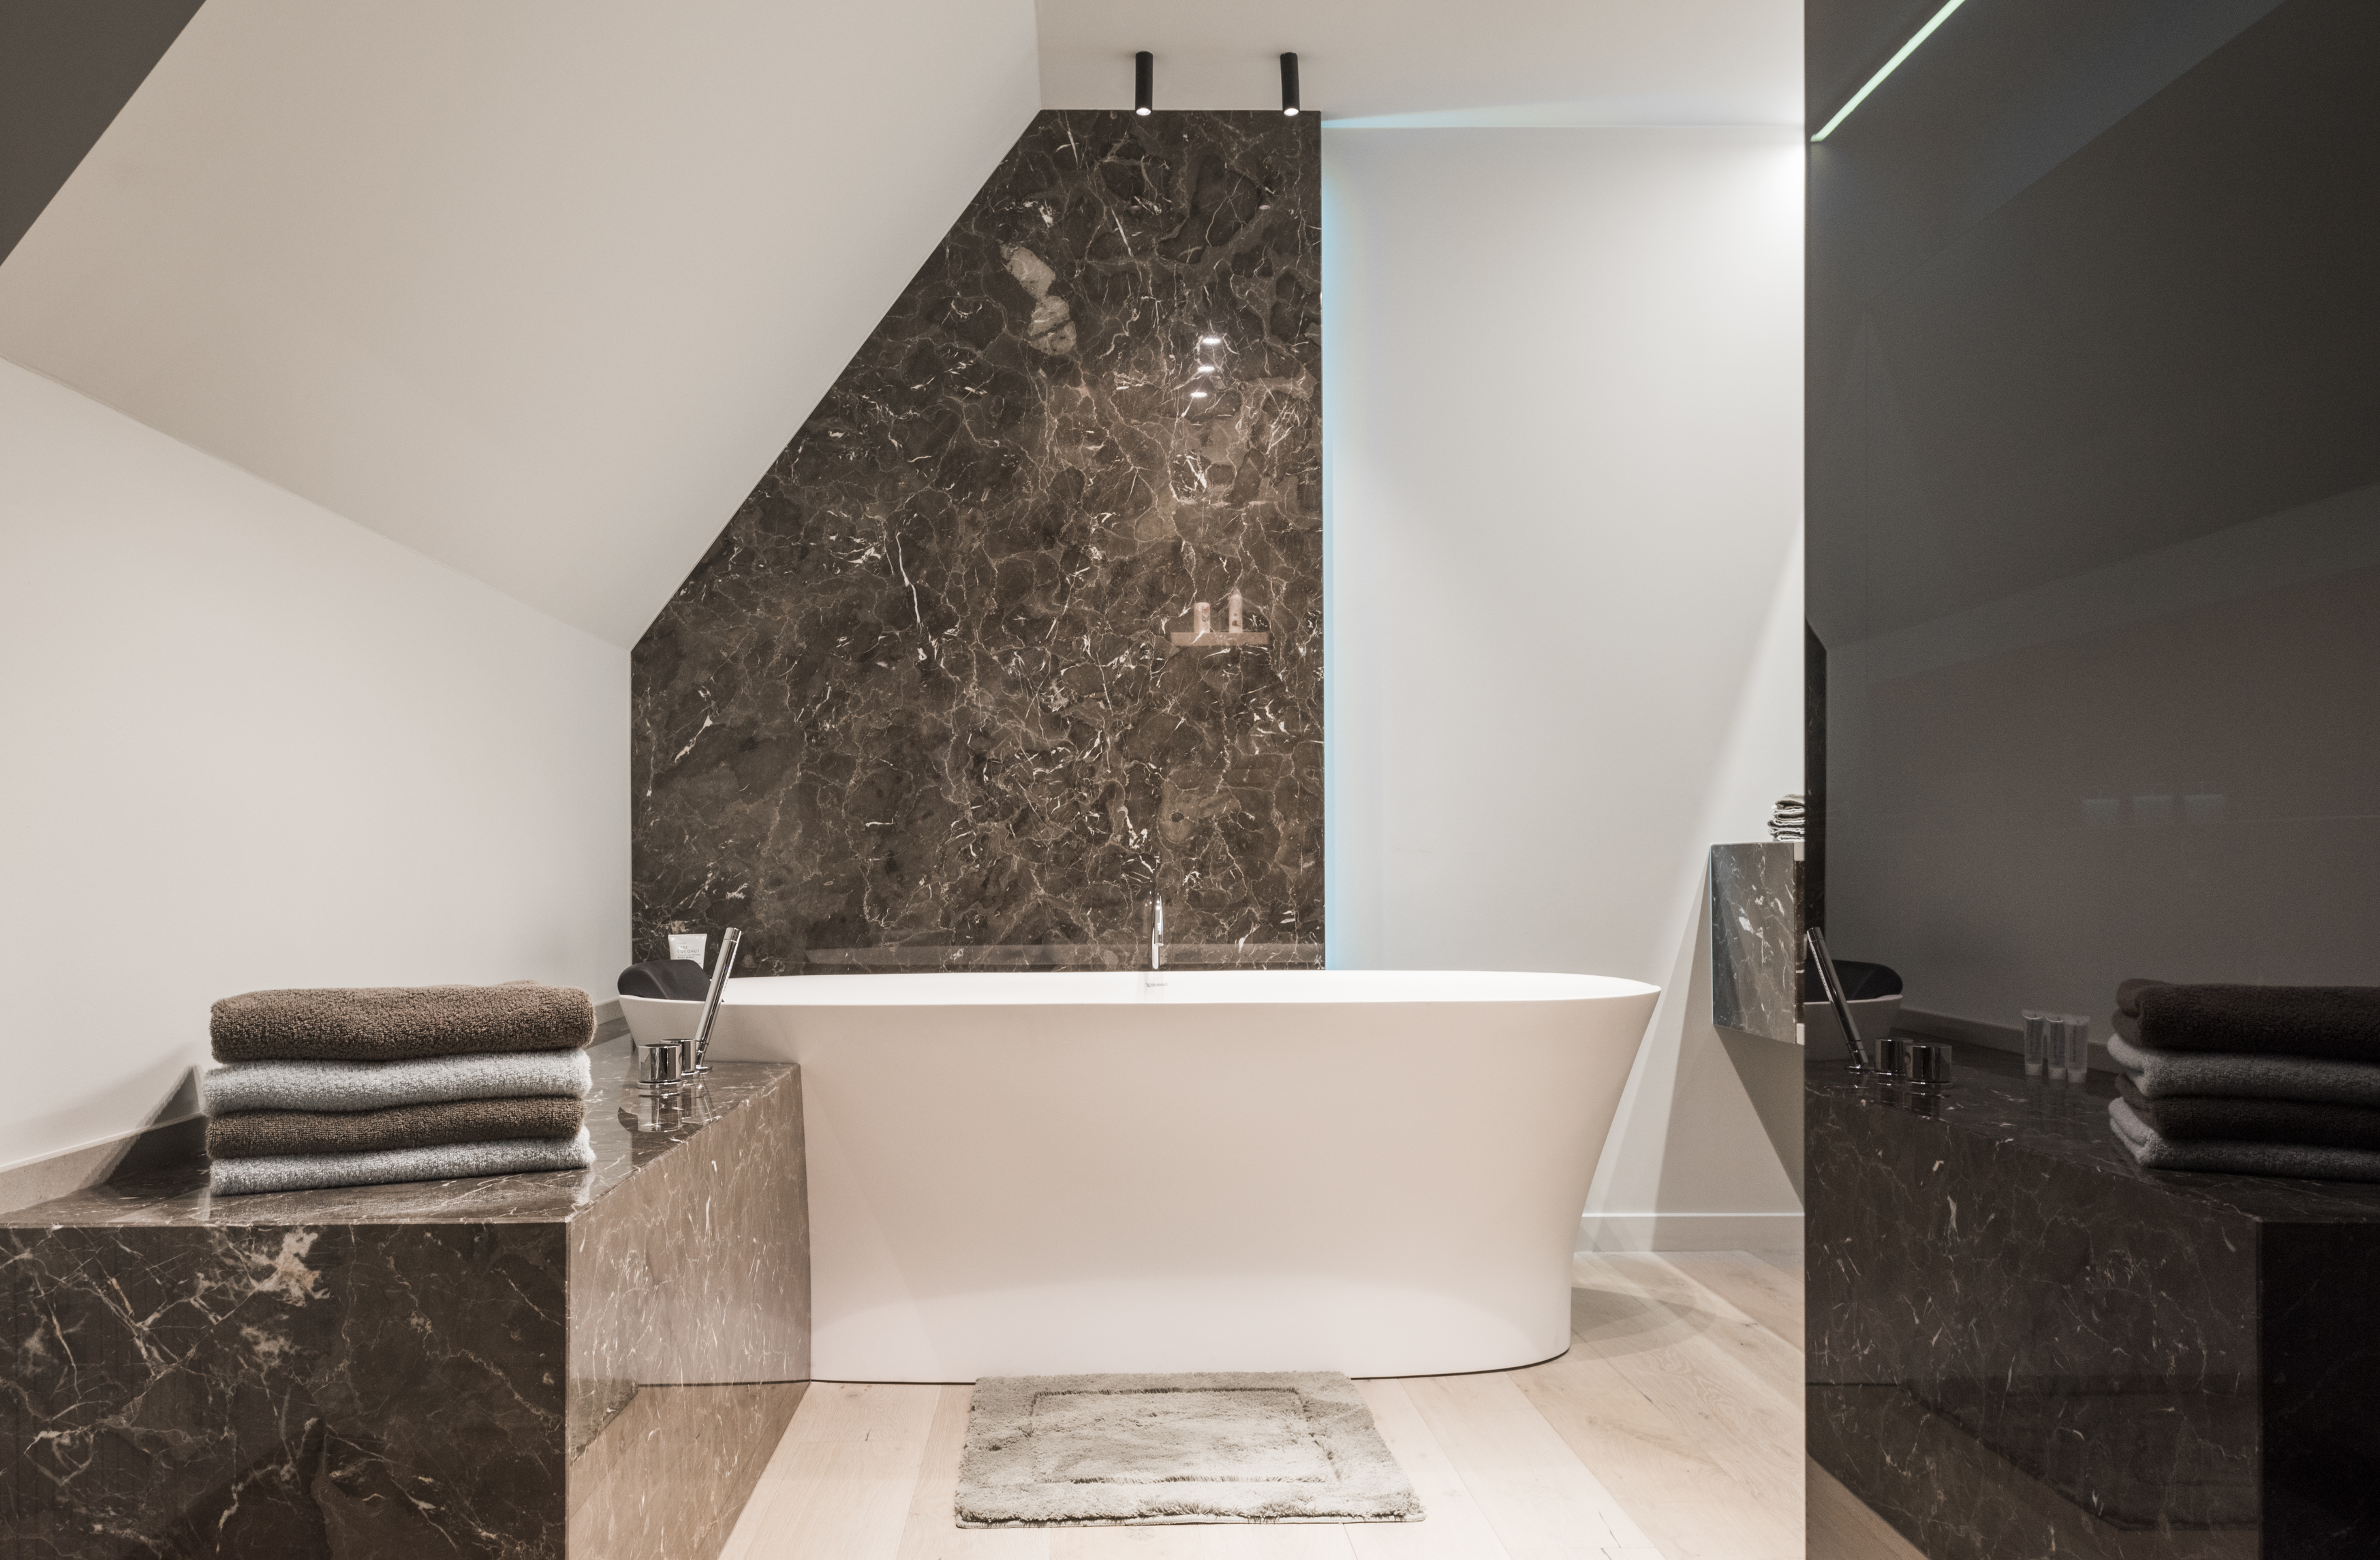 63 sensational bathrooms with natural stone walls - Beltrami Natuursteen Natural Stone Design Modern Badkamer Bathroom Emperador C